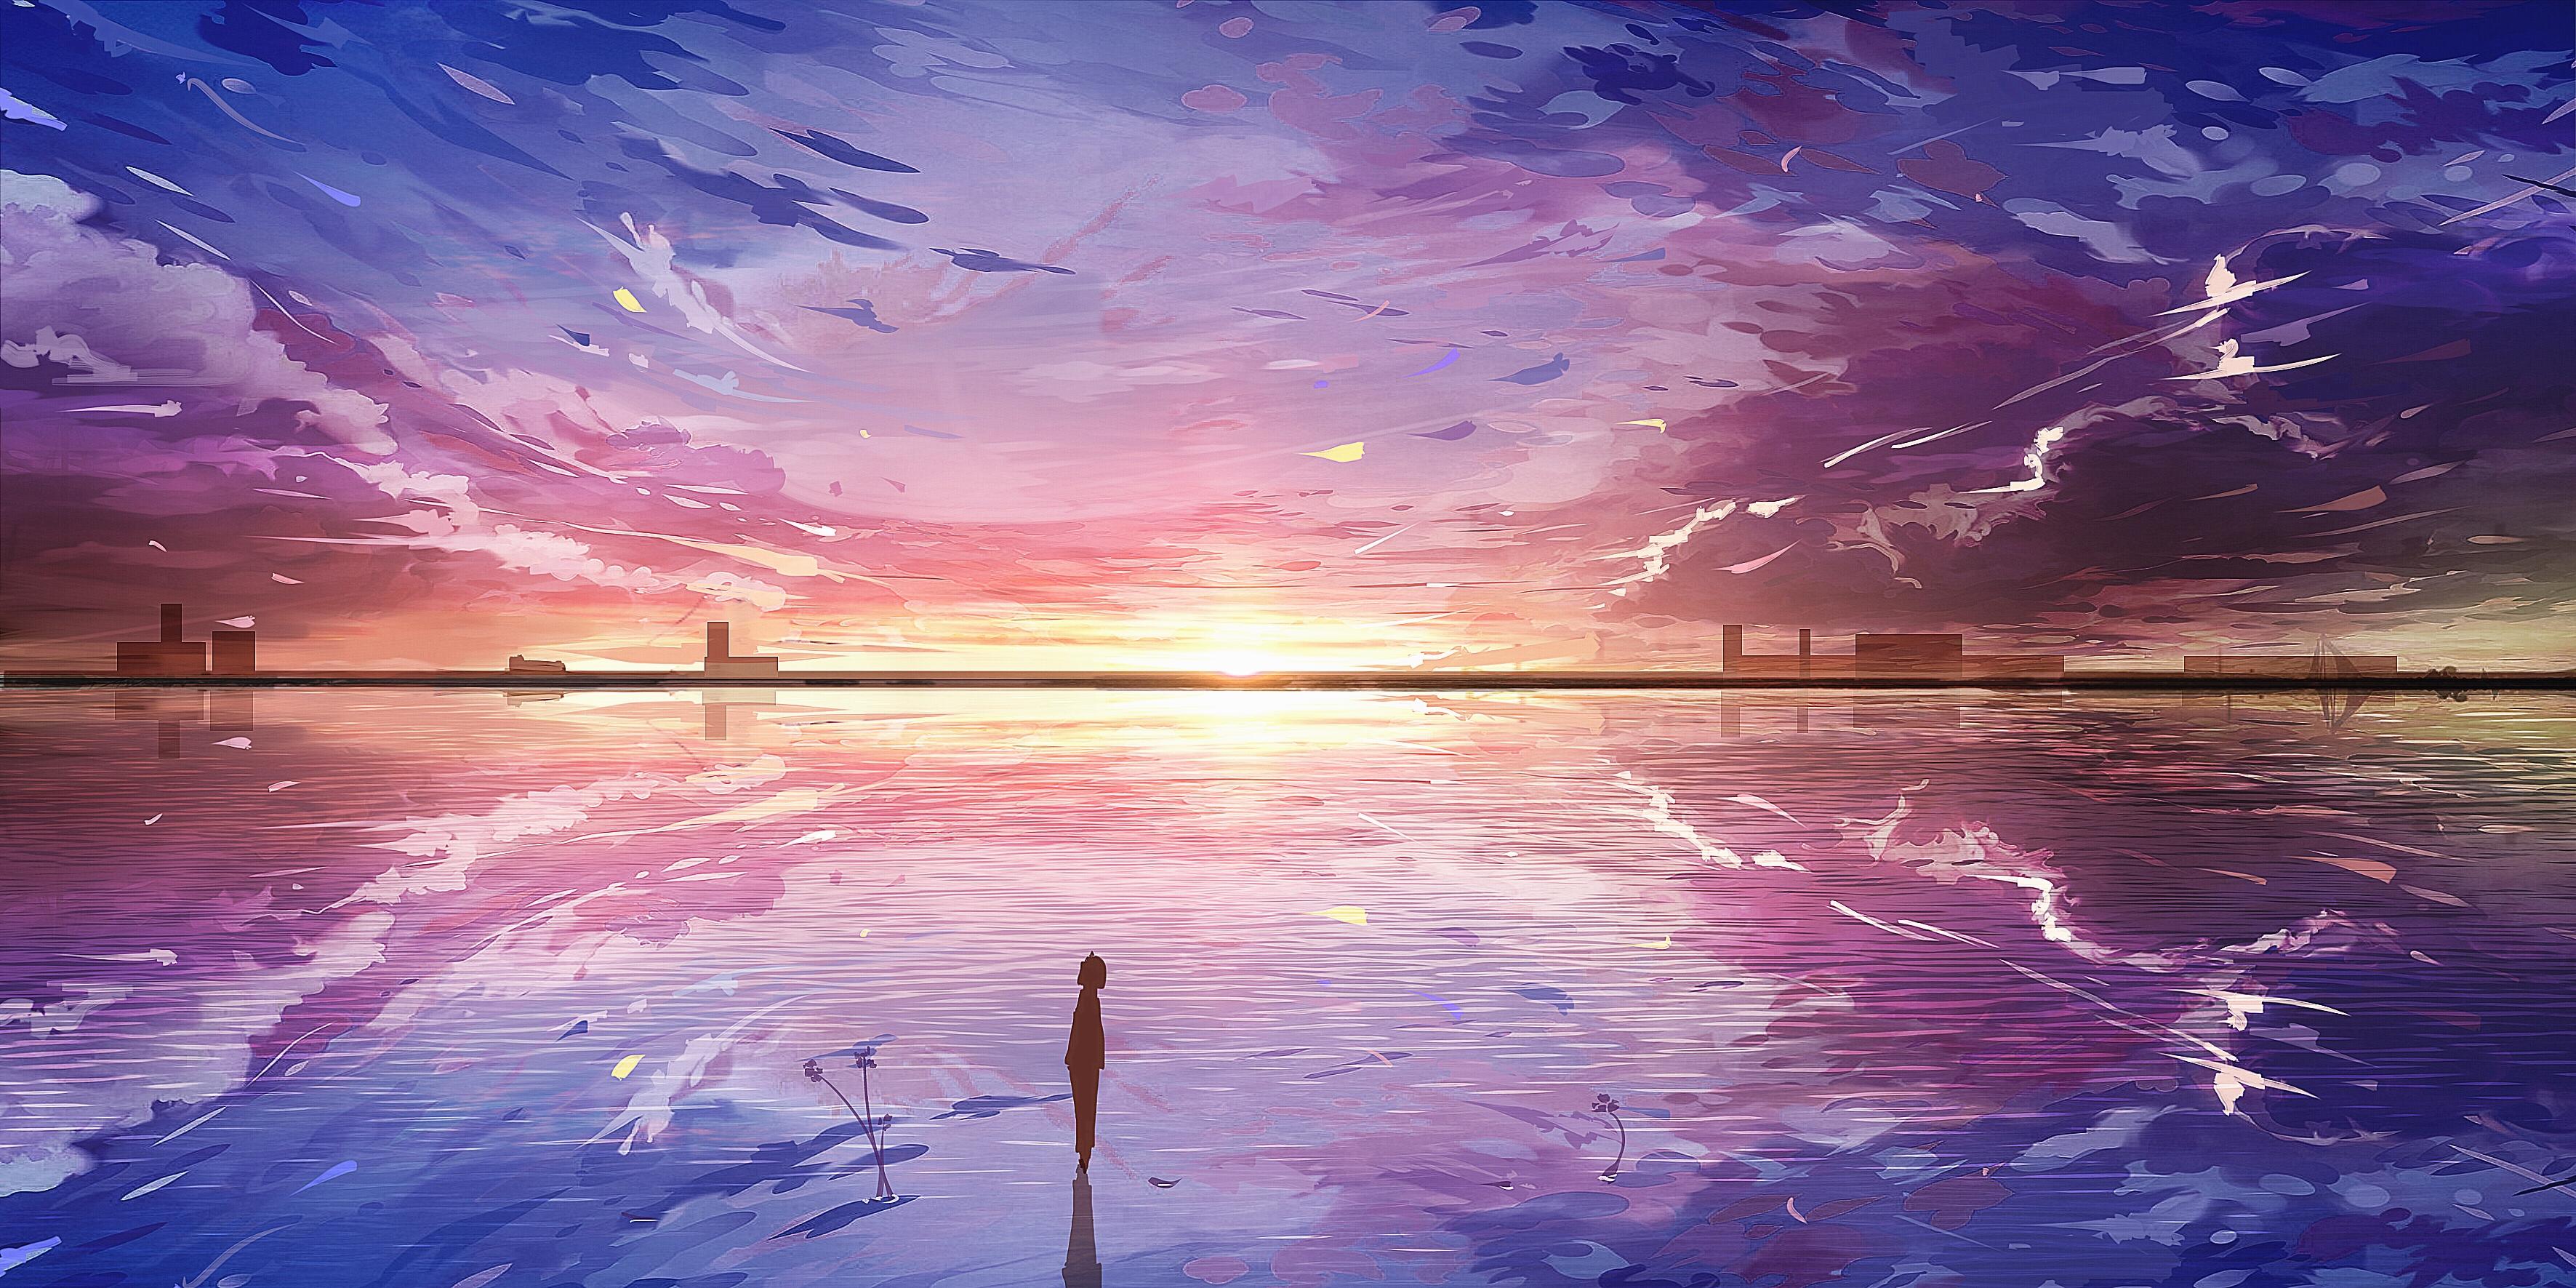 Anime Original Art 4k, HD Anime, 4k Wallpapers, Images ...